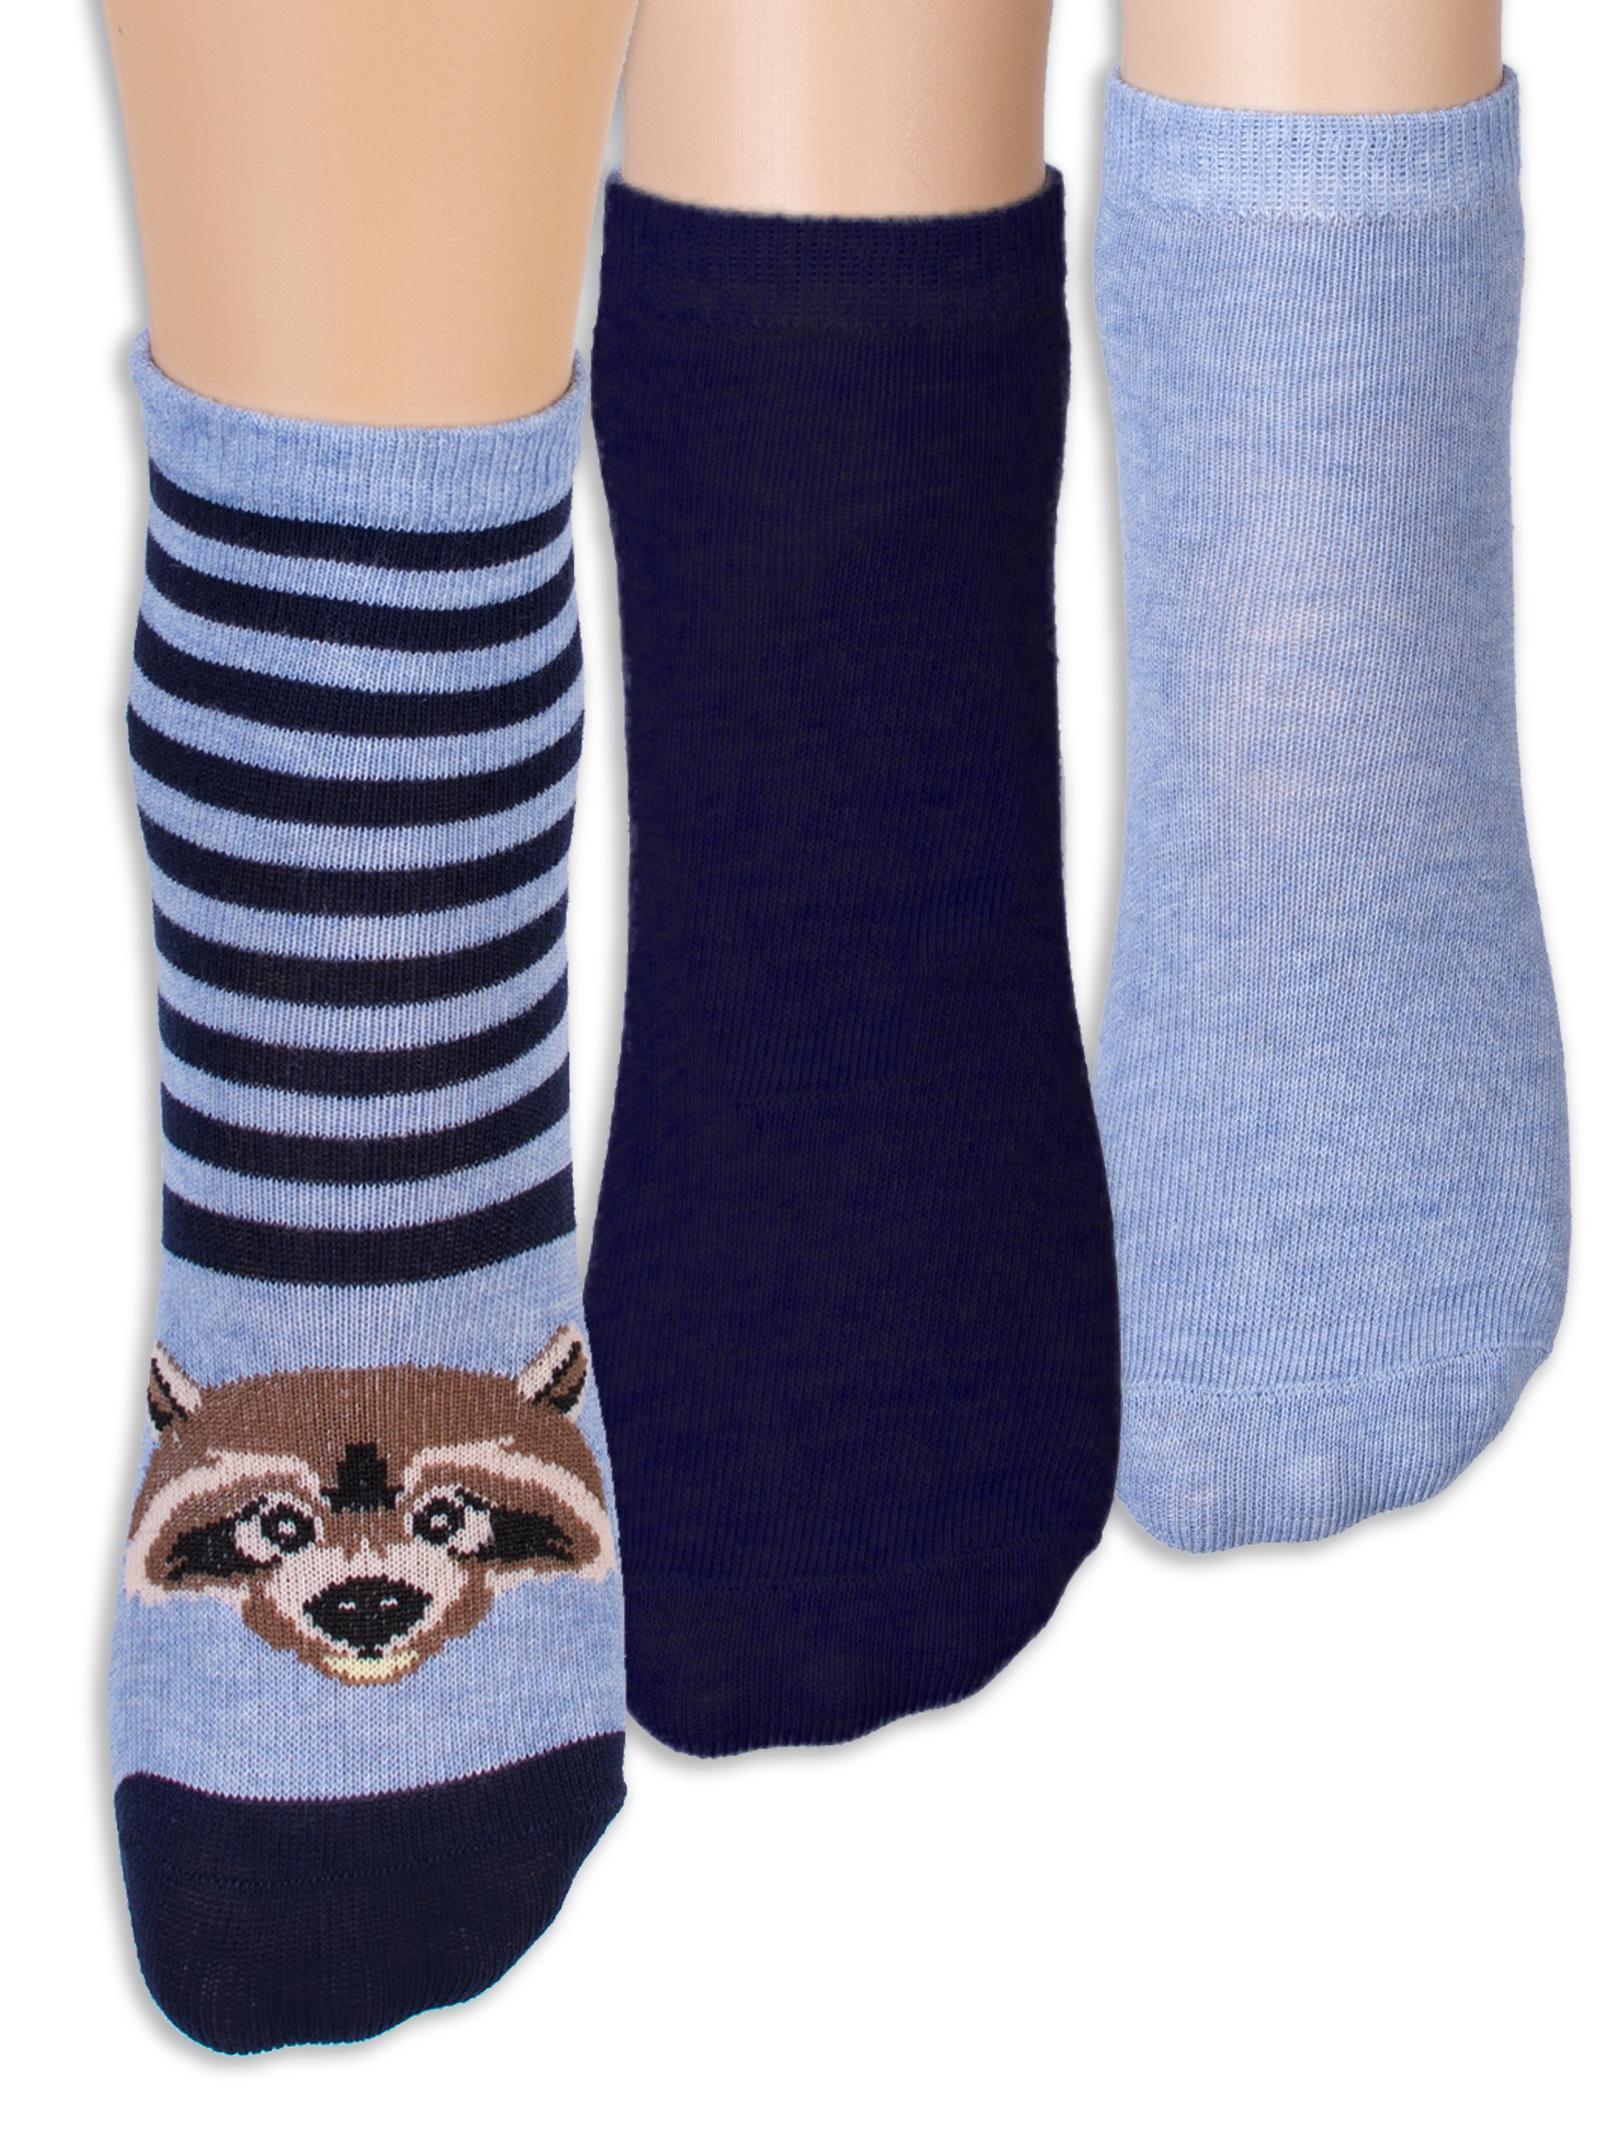 Носки Me&We, 3 шт носки детские soxo цвет синий голубой 76990 2 размер 19 21